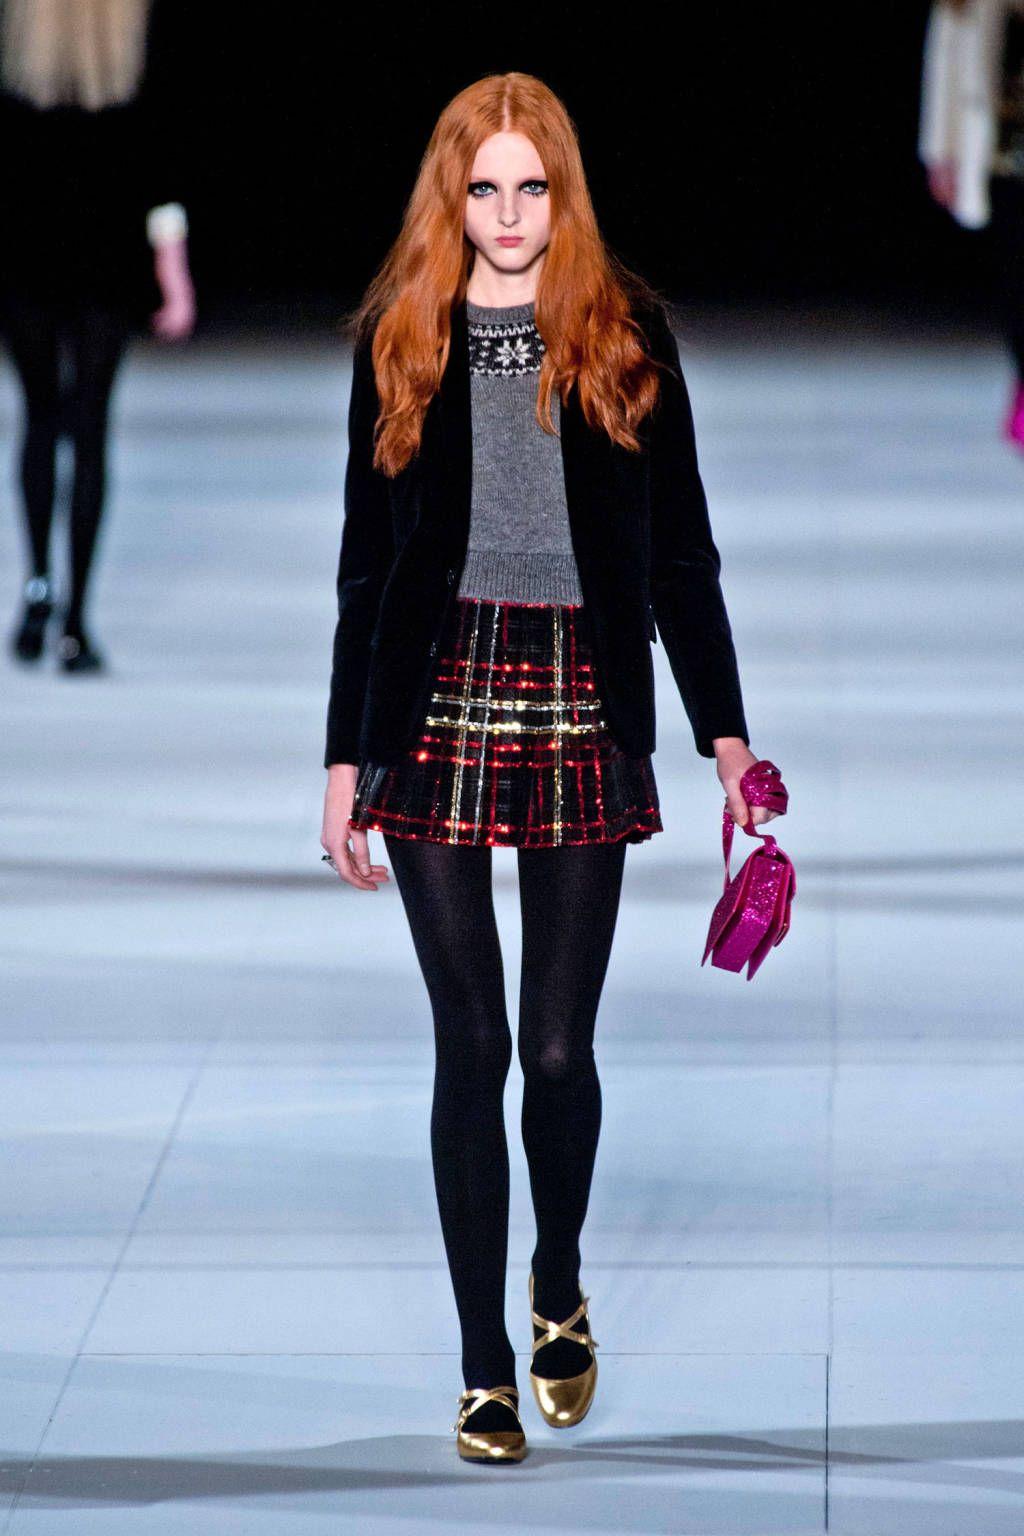 Saint Laurent - Paris Fashion Week Fall 2014 Runway Looks - Best Paris Runway Fashion - Harper's BAZAAR